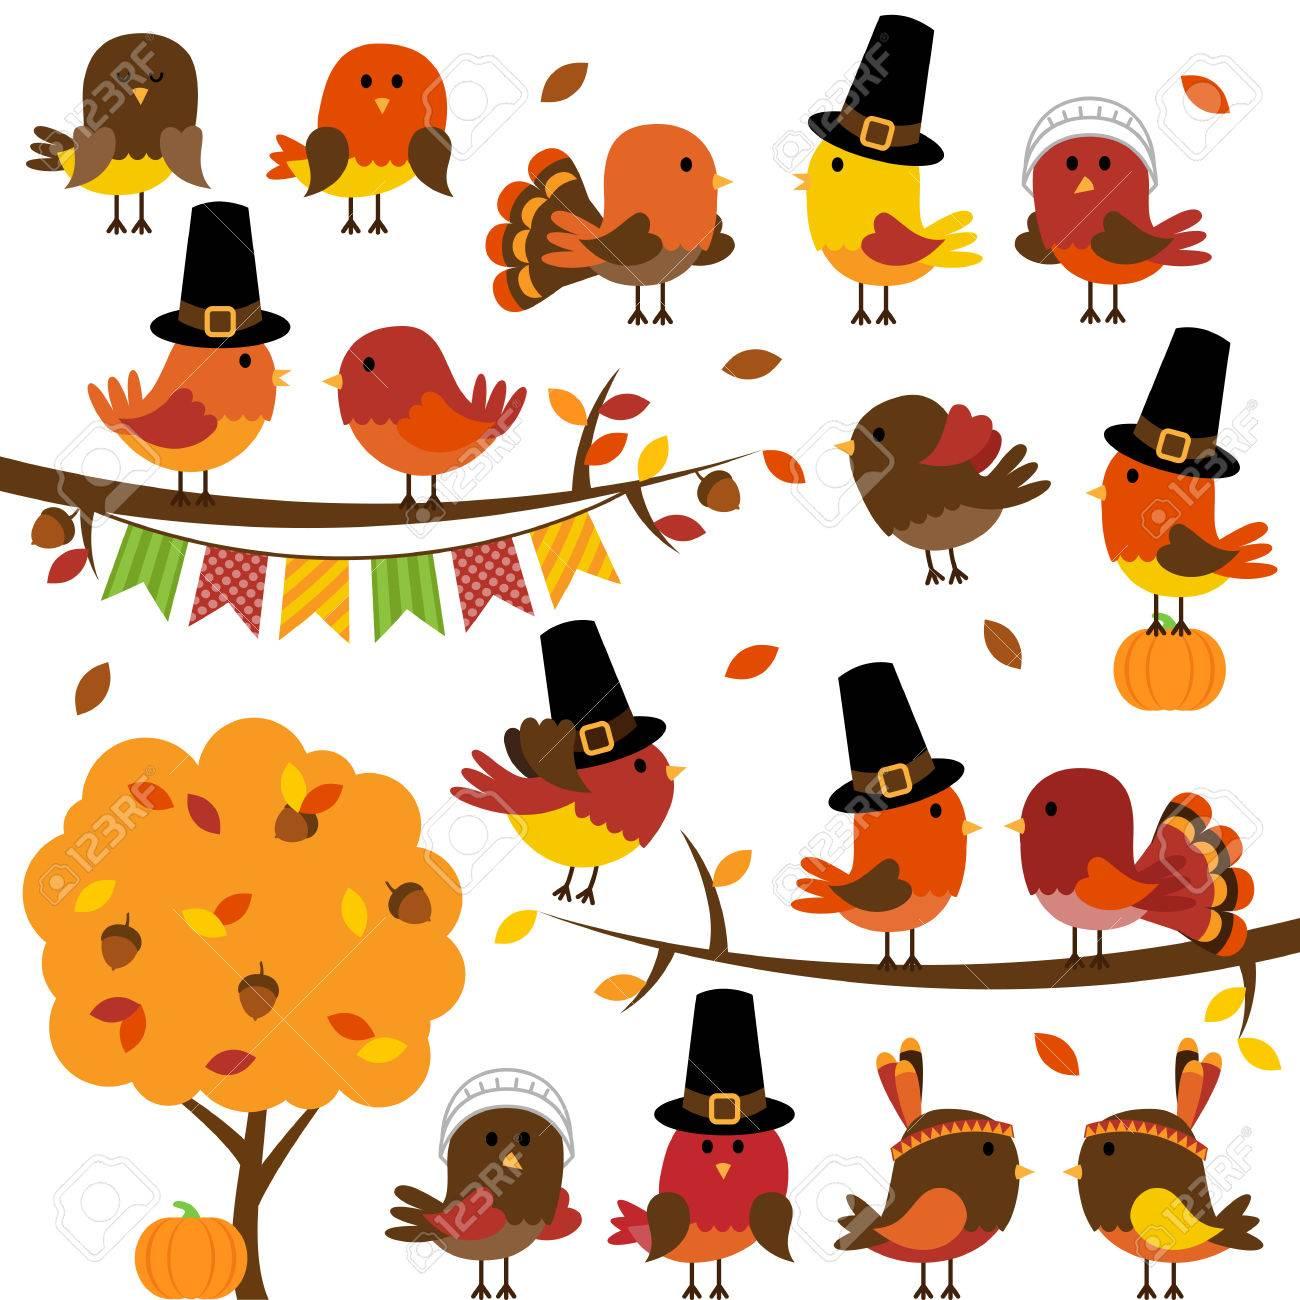 Vector Collection of Cute Thanksgiving and Autumn Birds - 44554486